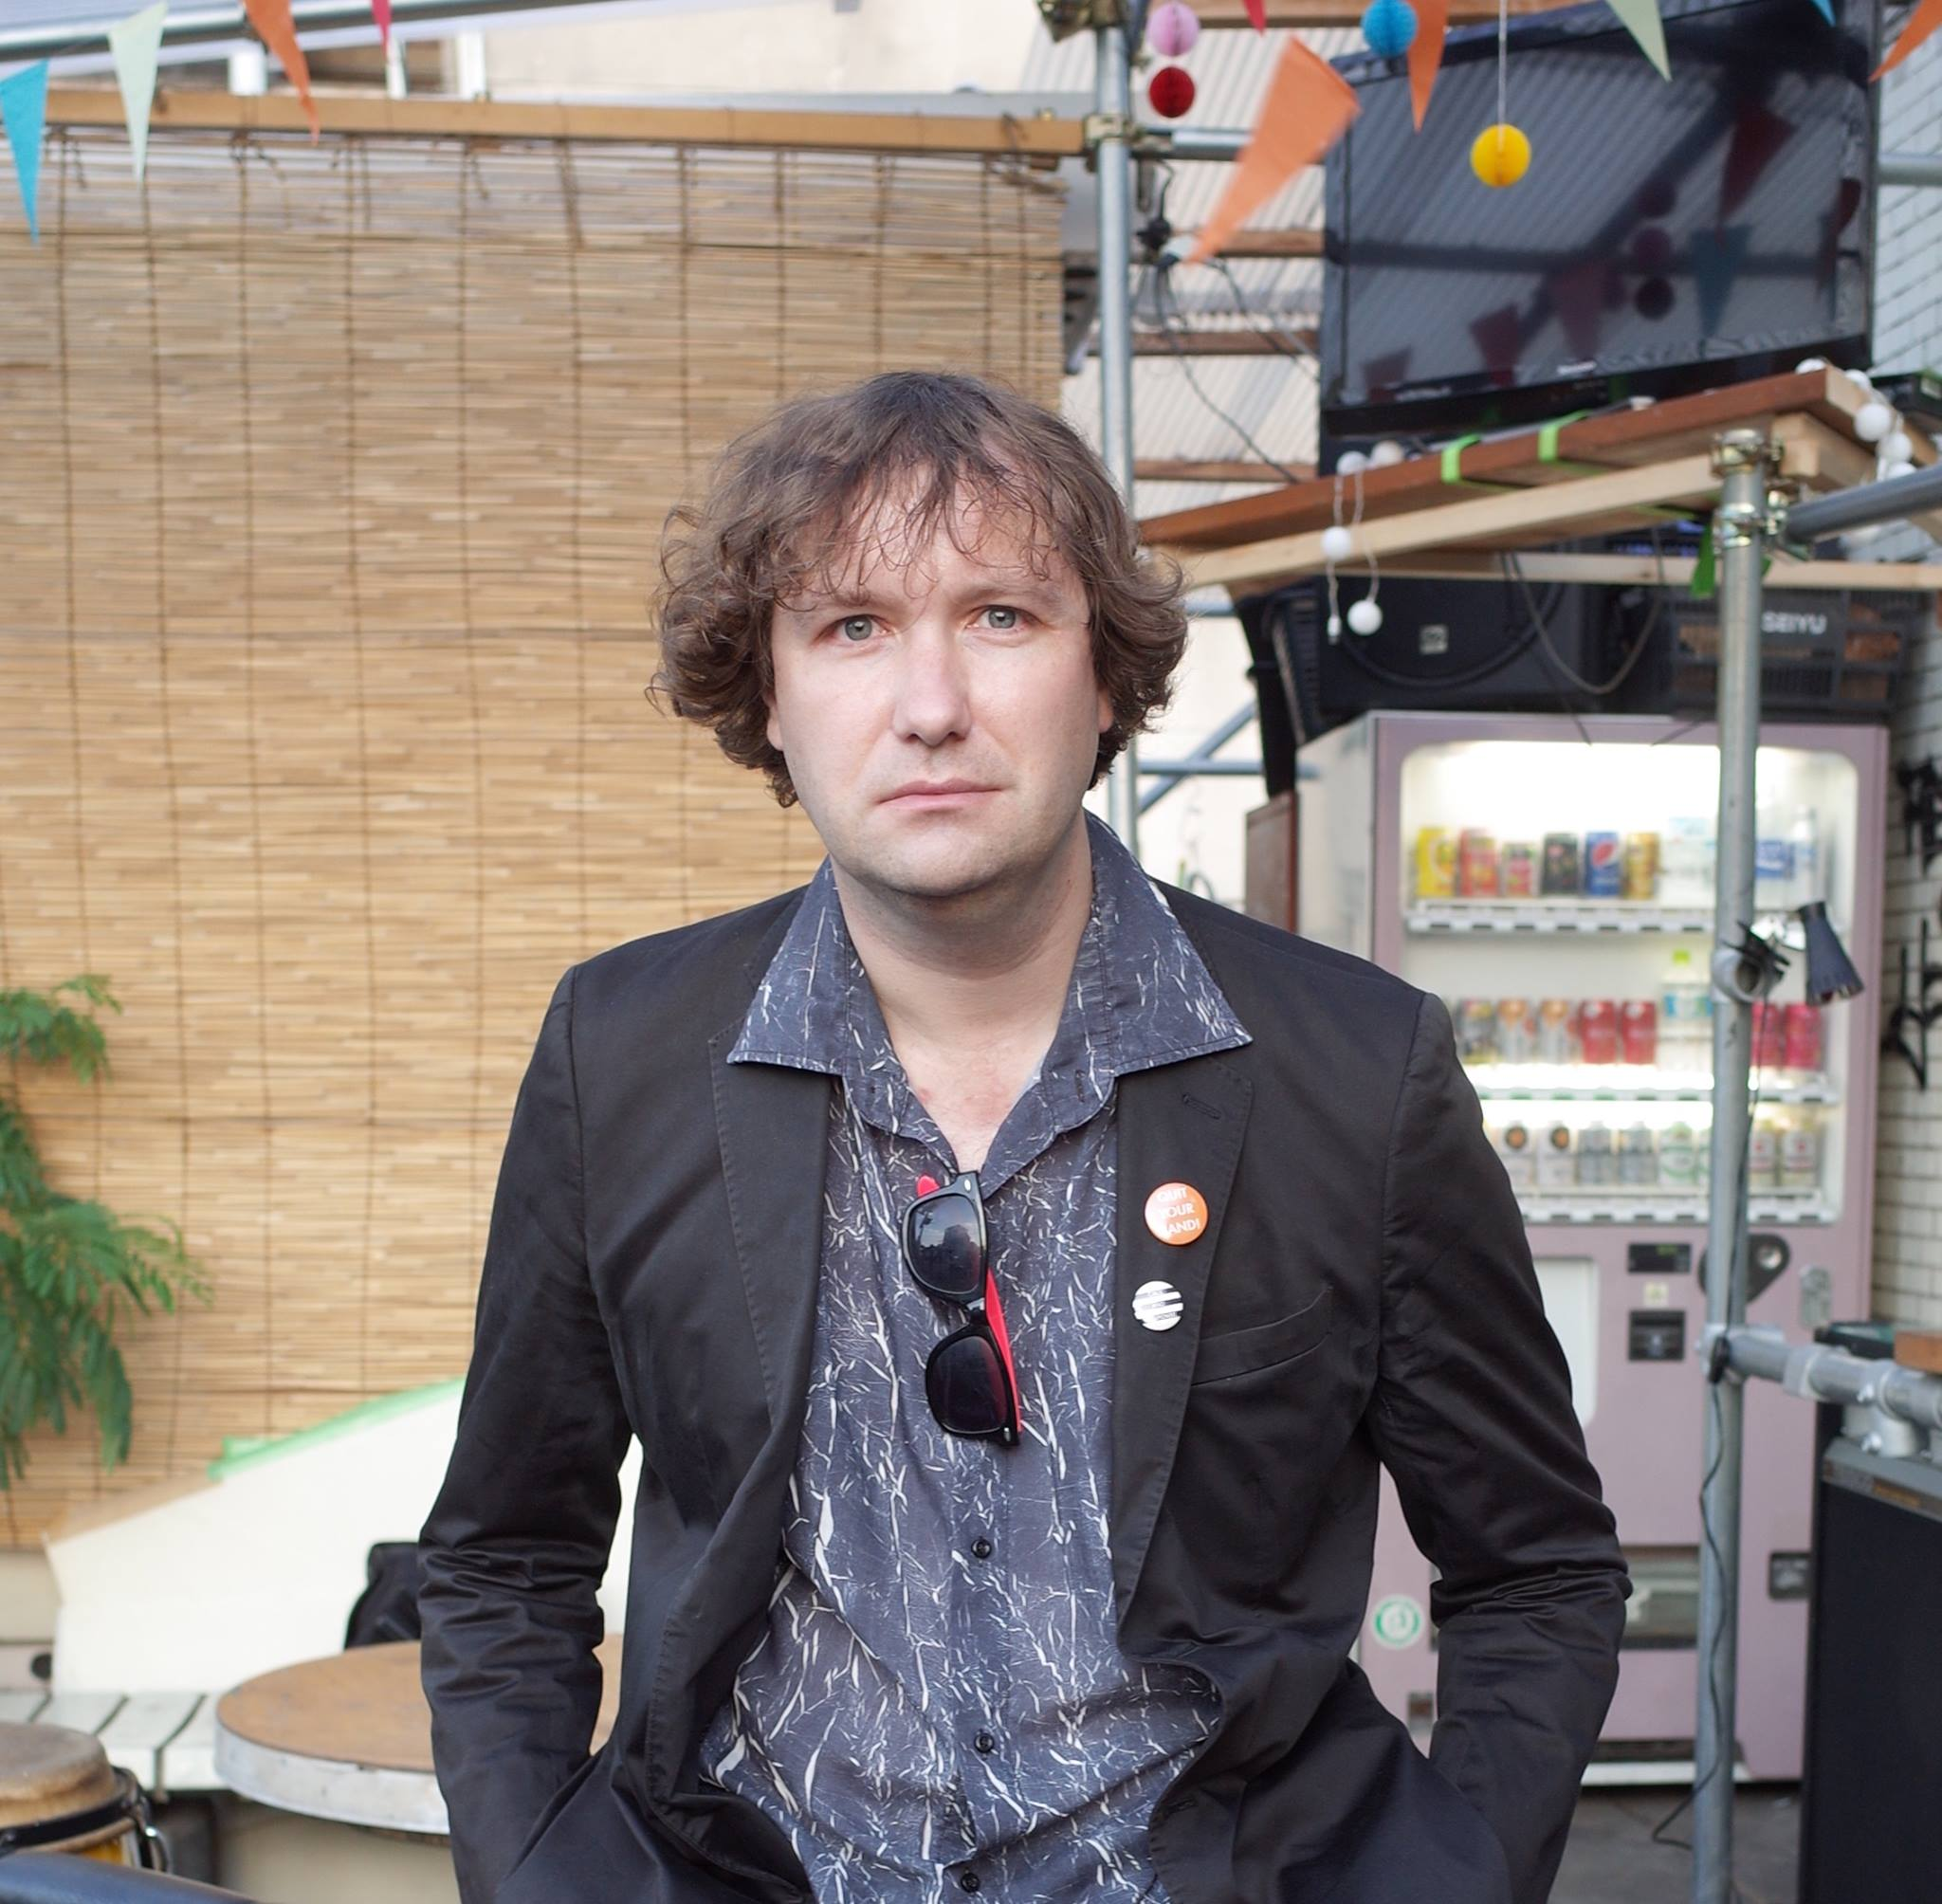 - Dj : Ian Martin (Call And Response Records) イアン・マーティンは東京を拠点とするインディーレーベルCall And Response Recordsを主宰して10年以上となる。日本のインディー音楽シーンについて執筆もしており、著書「Quit Your Band! Musical Notes from the Japanese Underground」が2016年Awai Booksより出版された。  https://callandresponse.jimdo.com